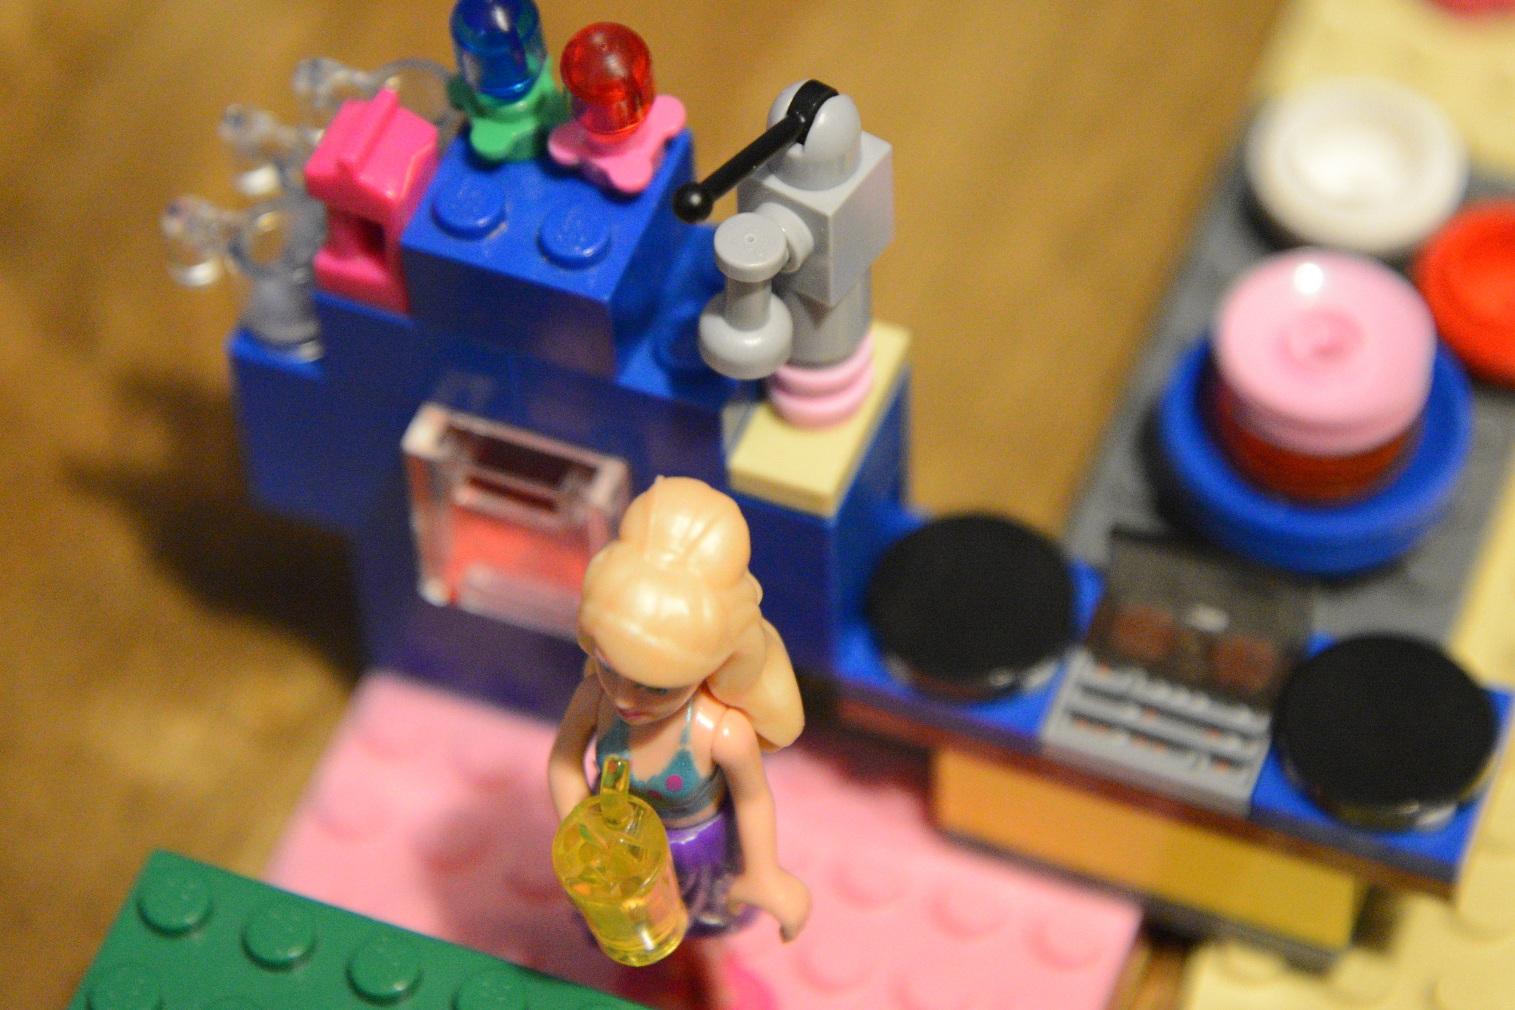 Lego Juicer